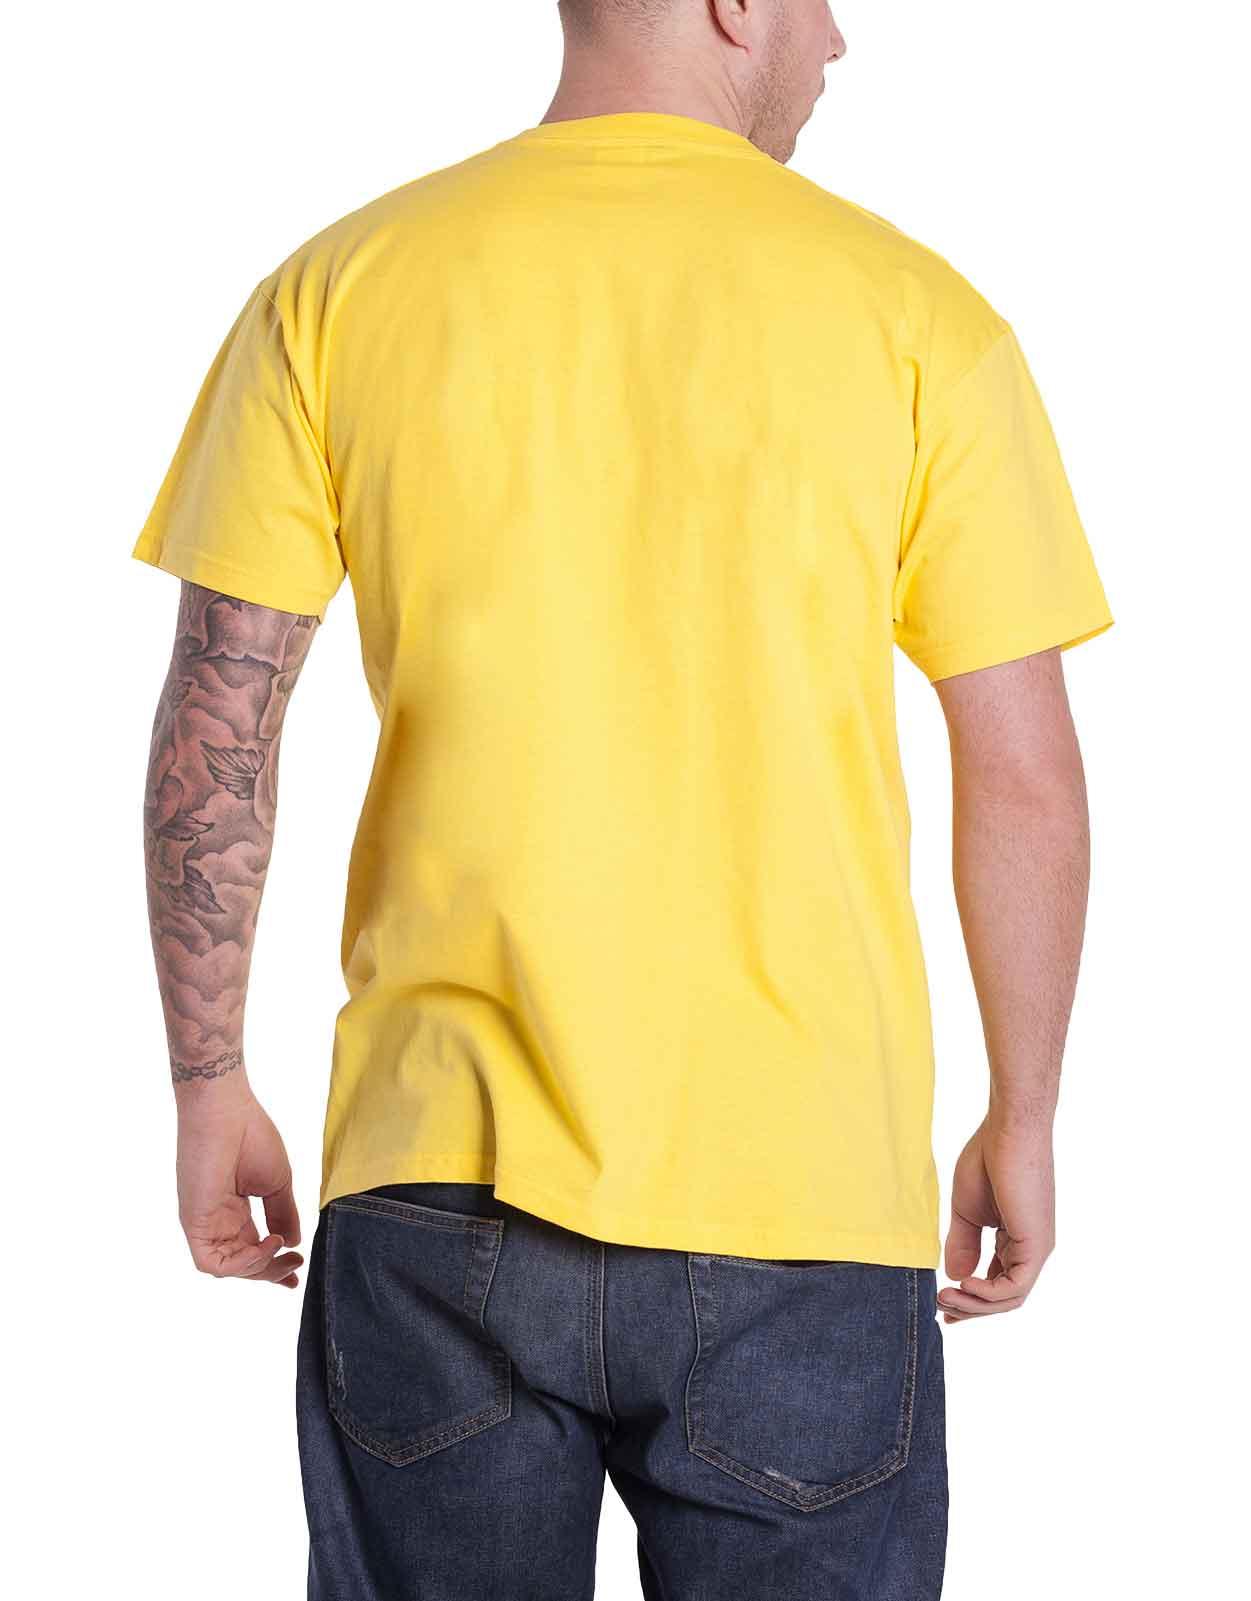 Officiel-Jimi-Hendrix-T-Shirt-Purple-Haze-Are-you-experienced-Logo-Homme-NEUF miniature 19